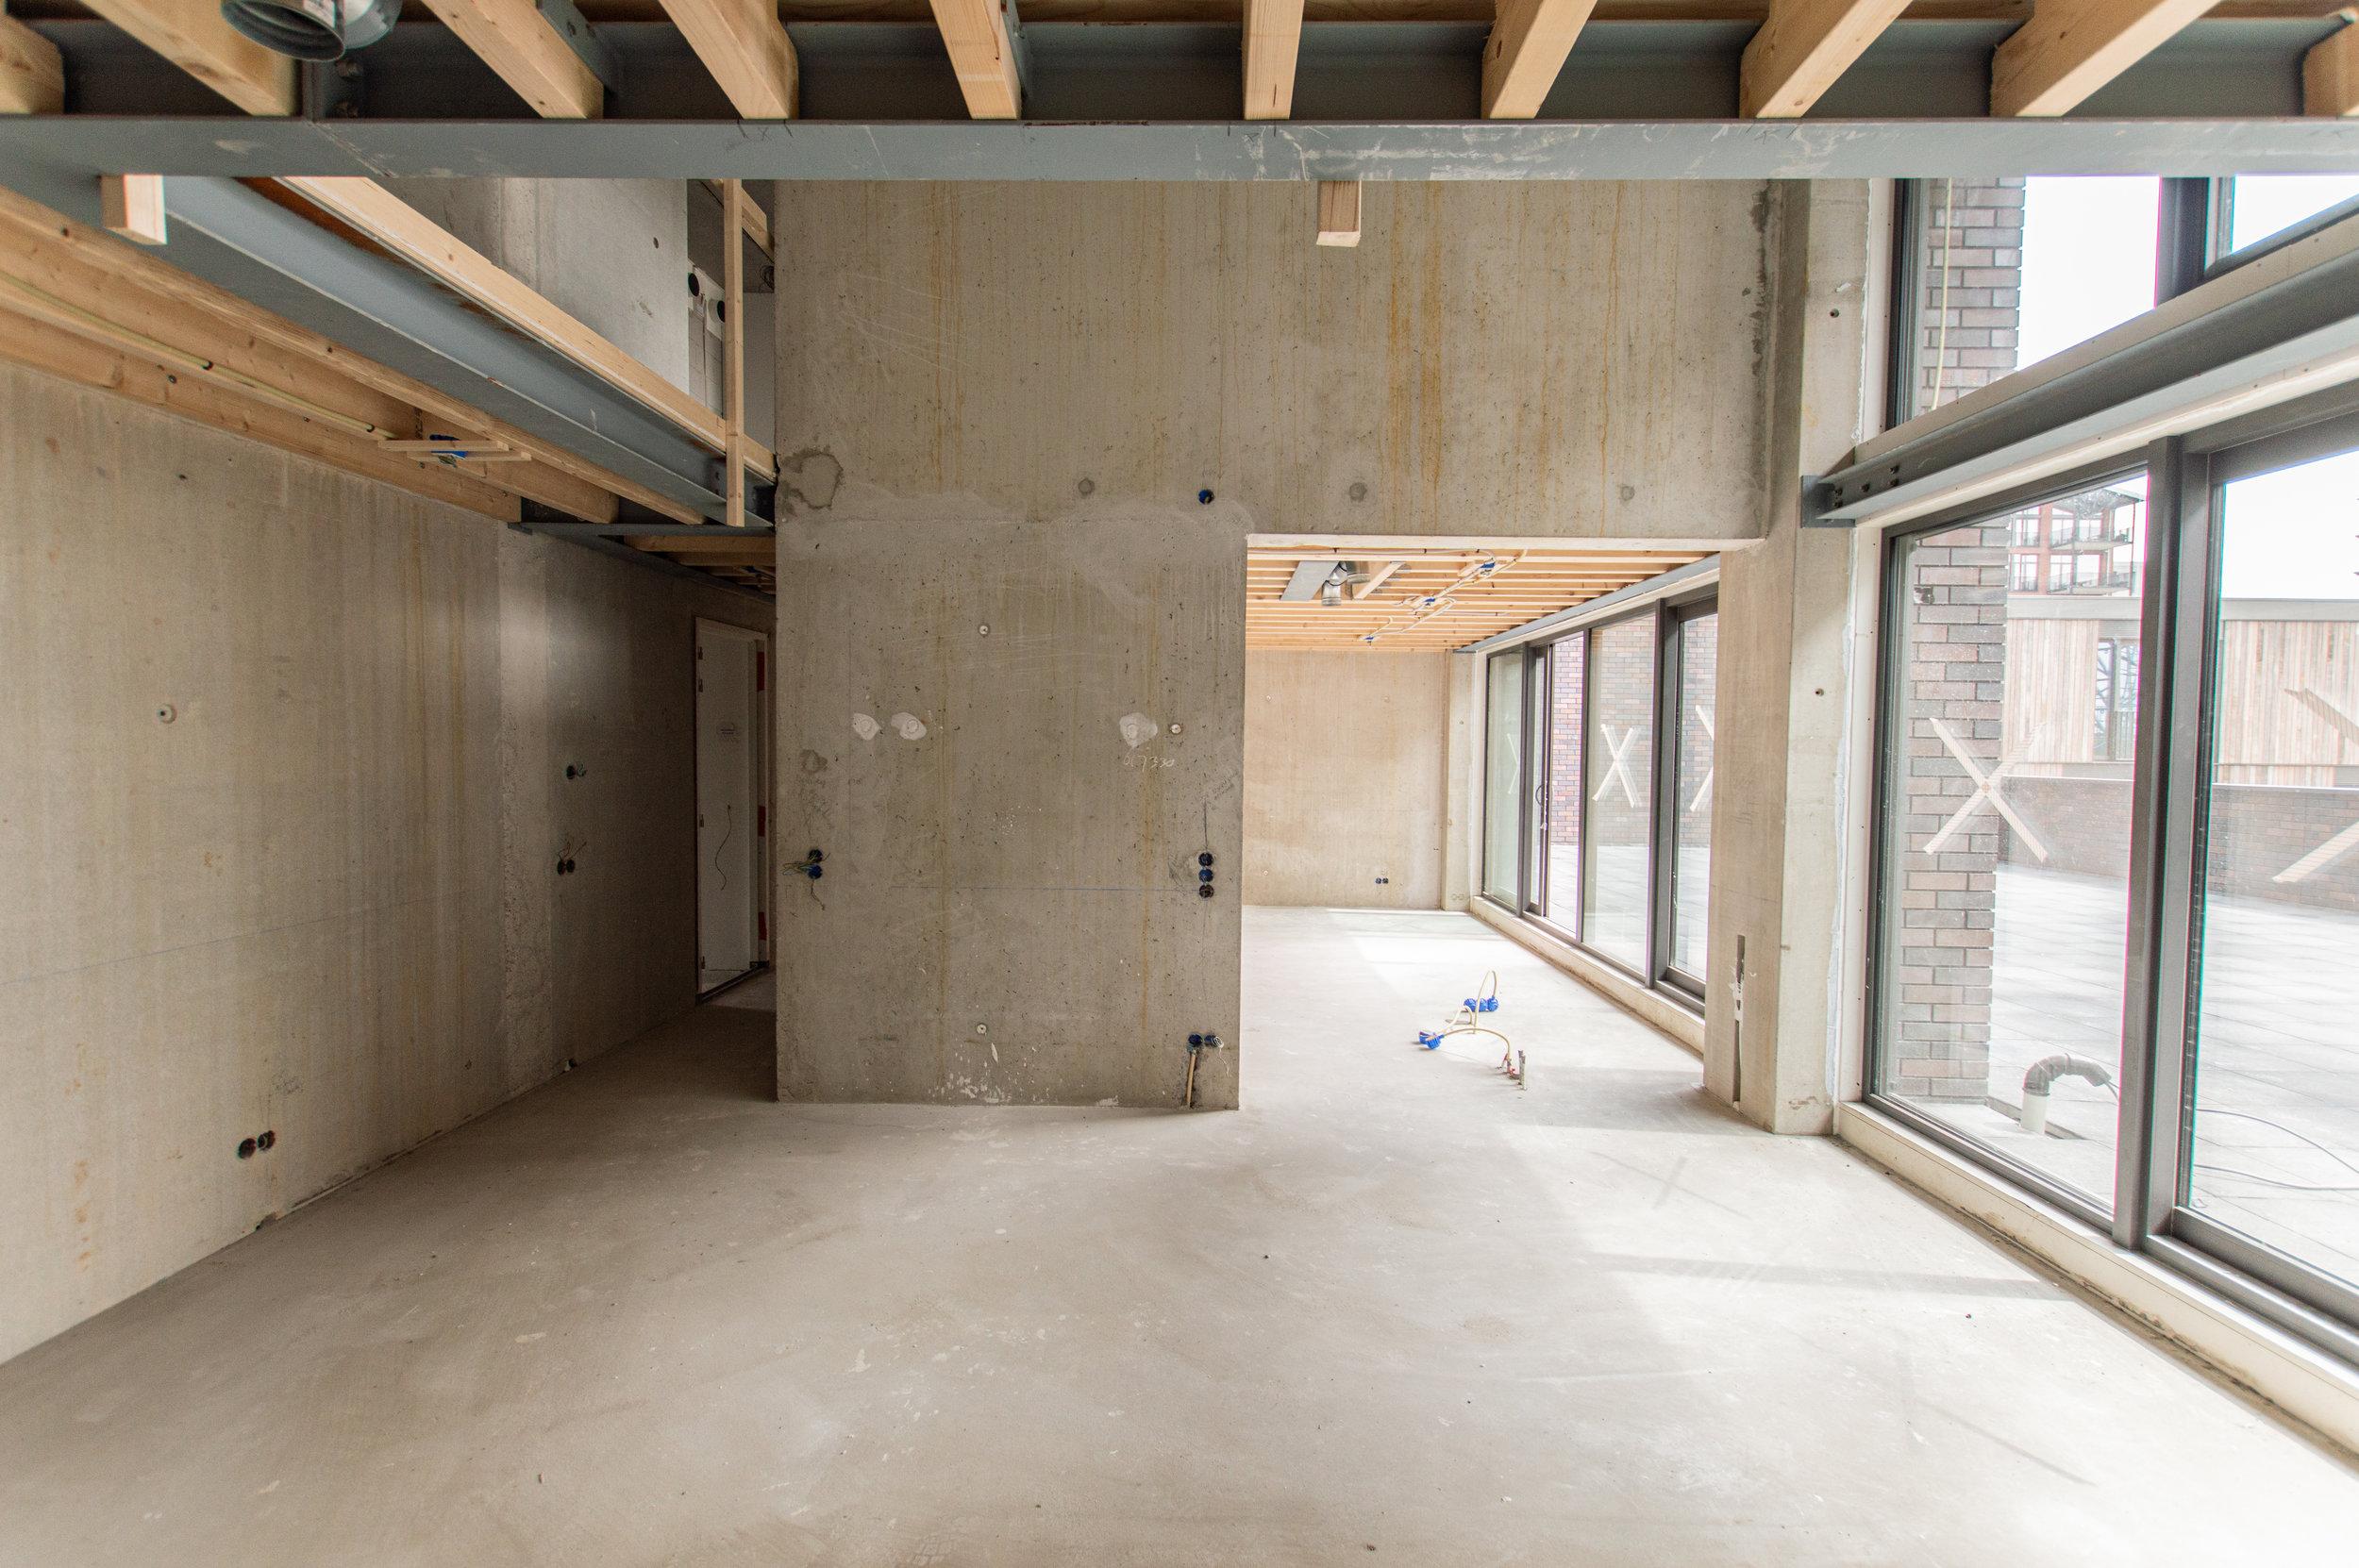 interieur met betonwand en betonvloer